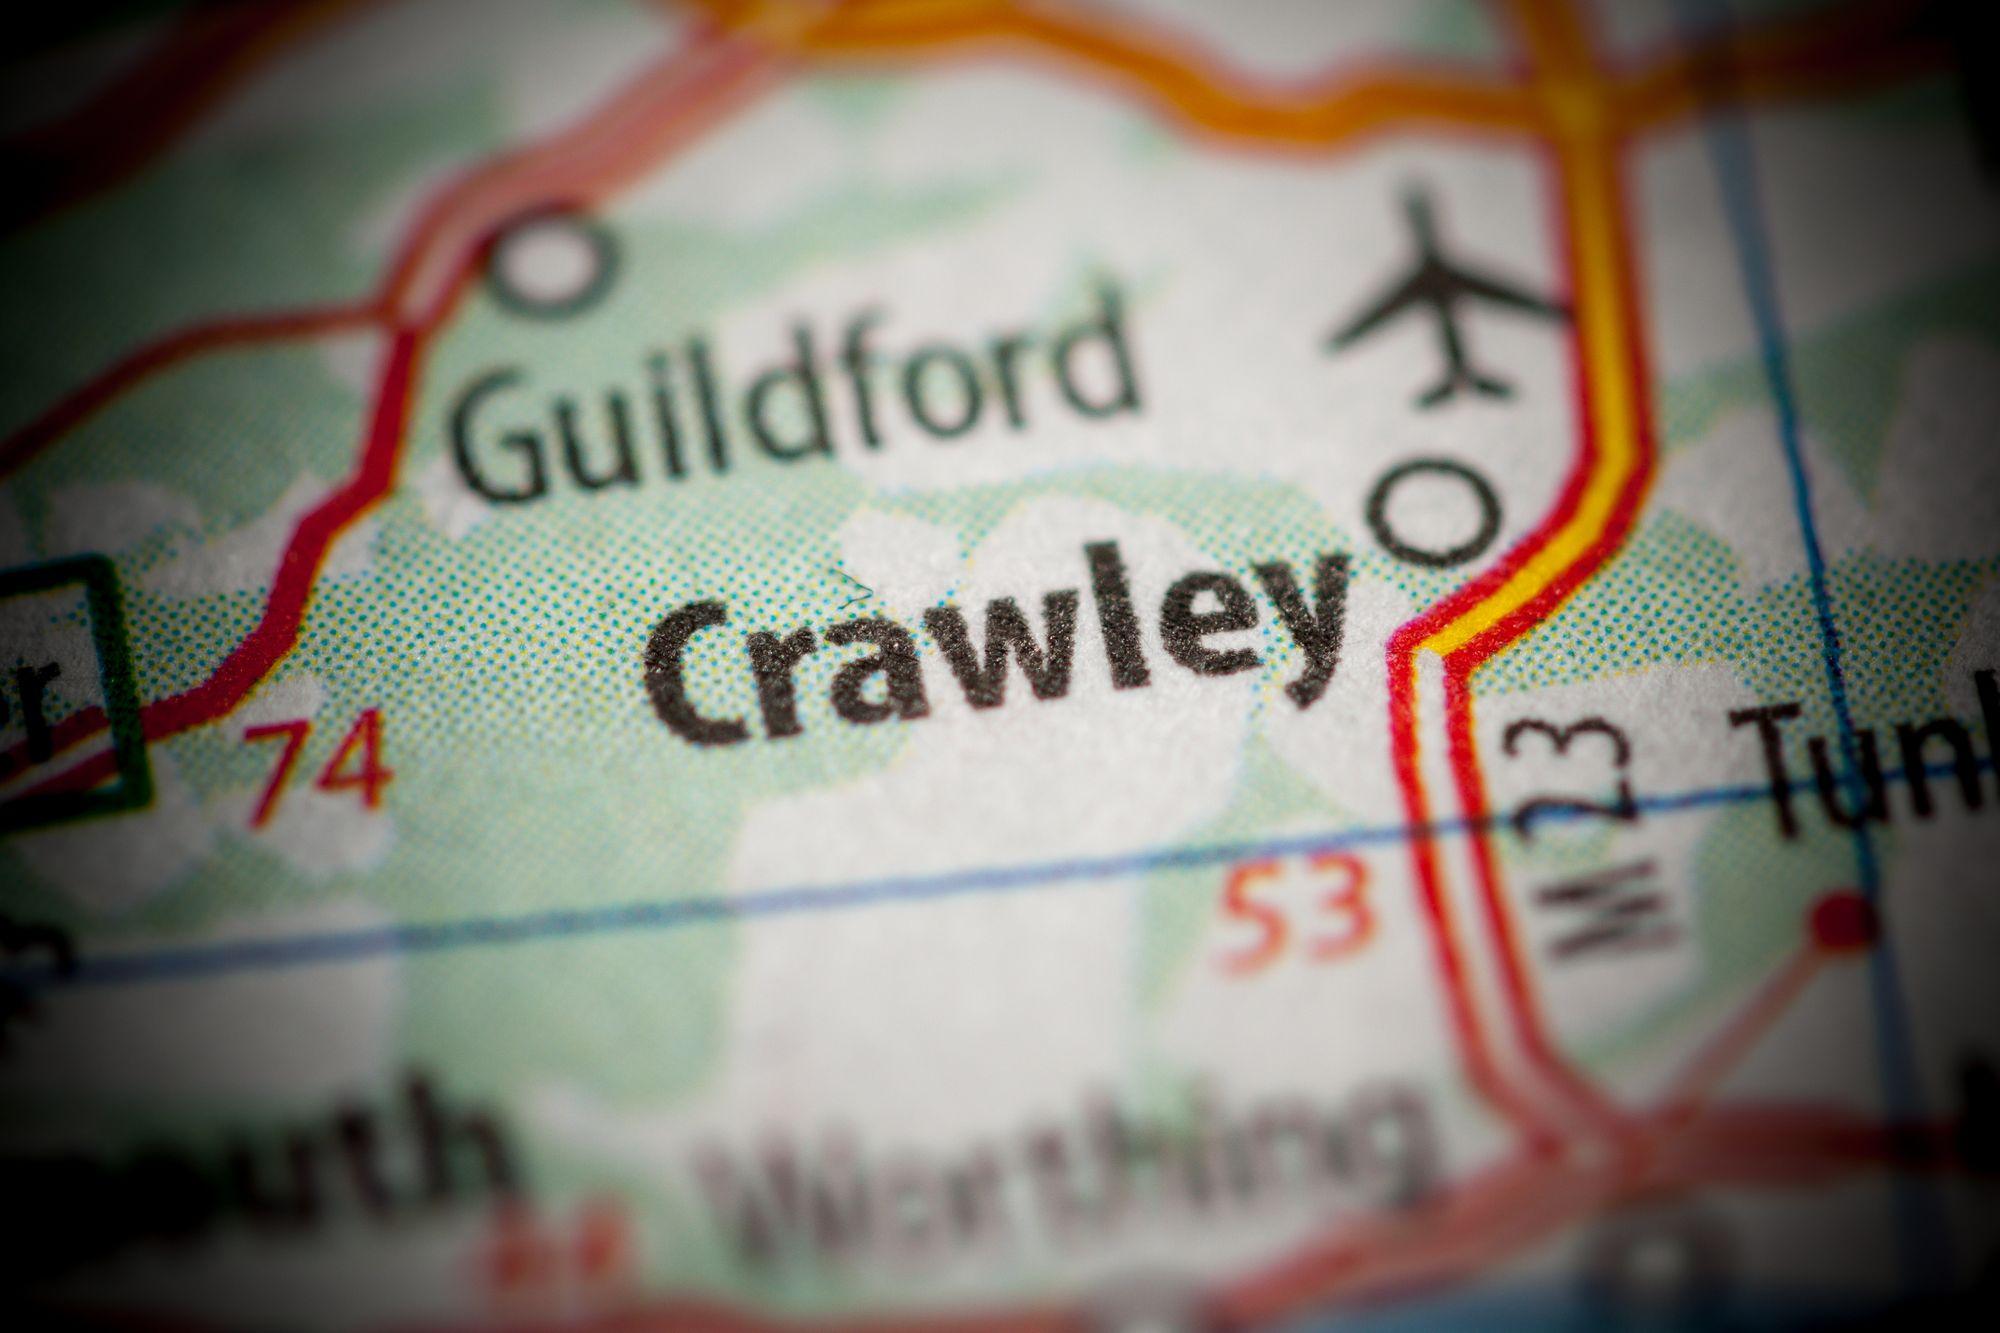 Living in Crawley